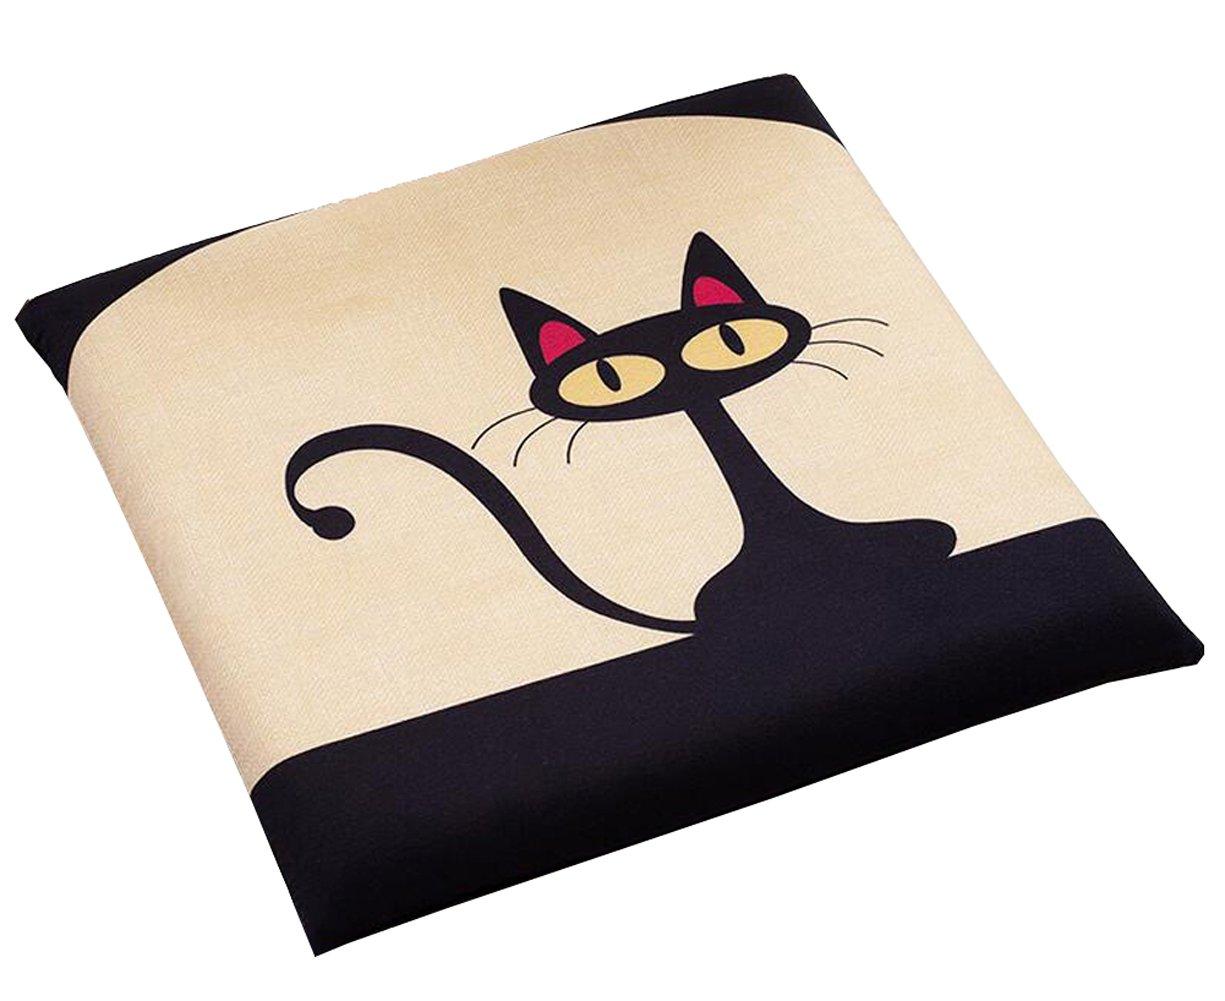 Cute Cartoon Animal Seat Cushion Soft Home Office Dining Chair Cushion (Black Cat)